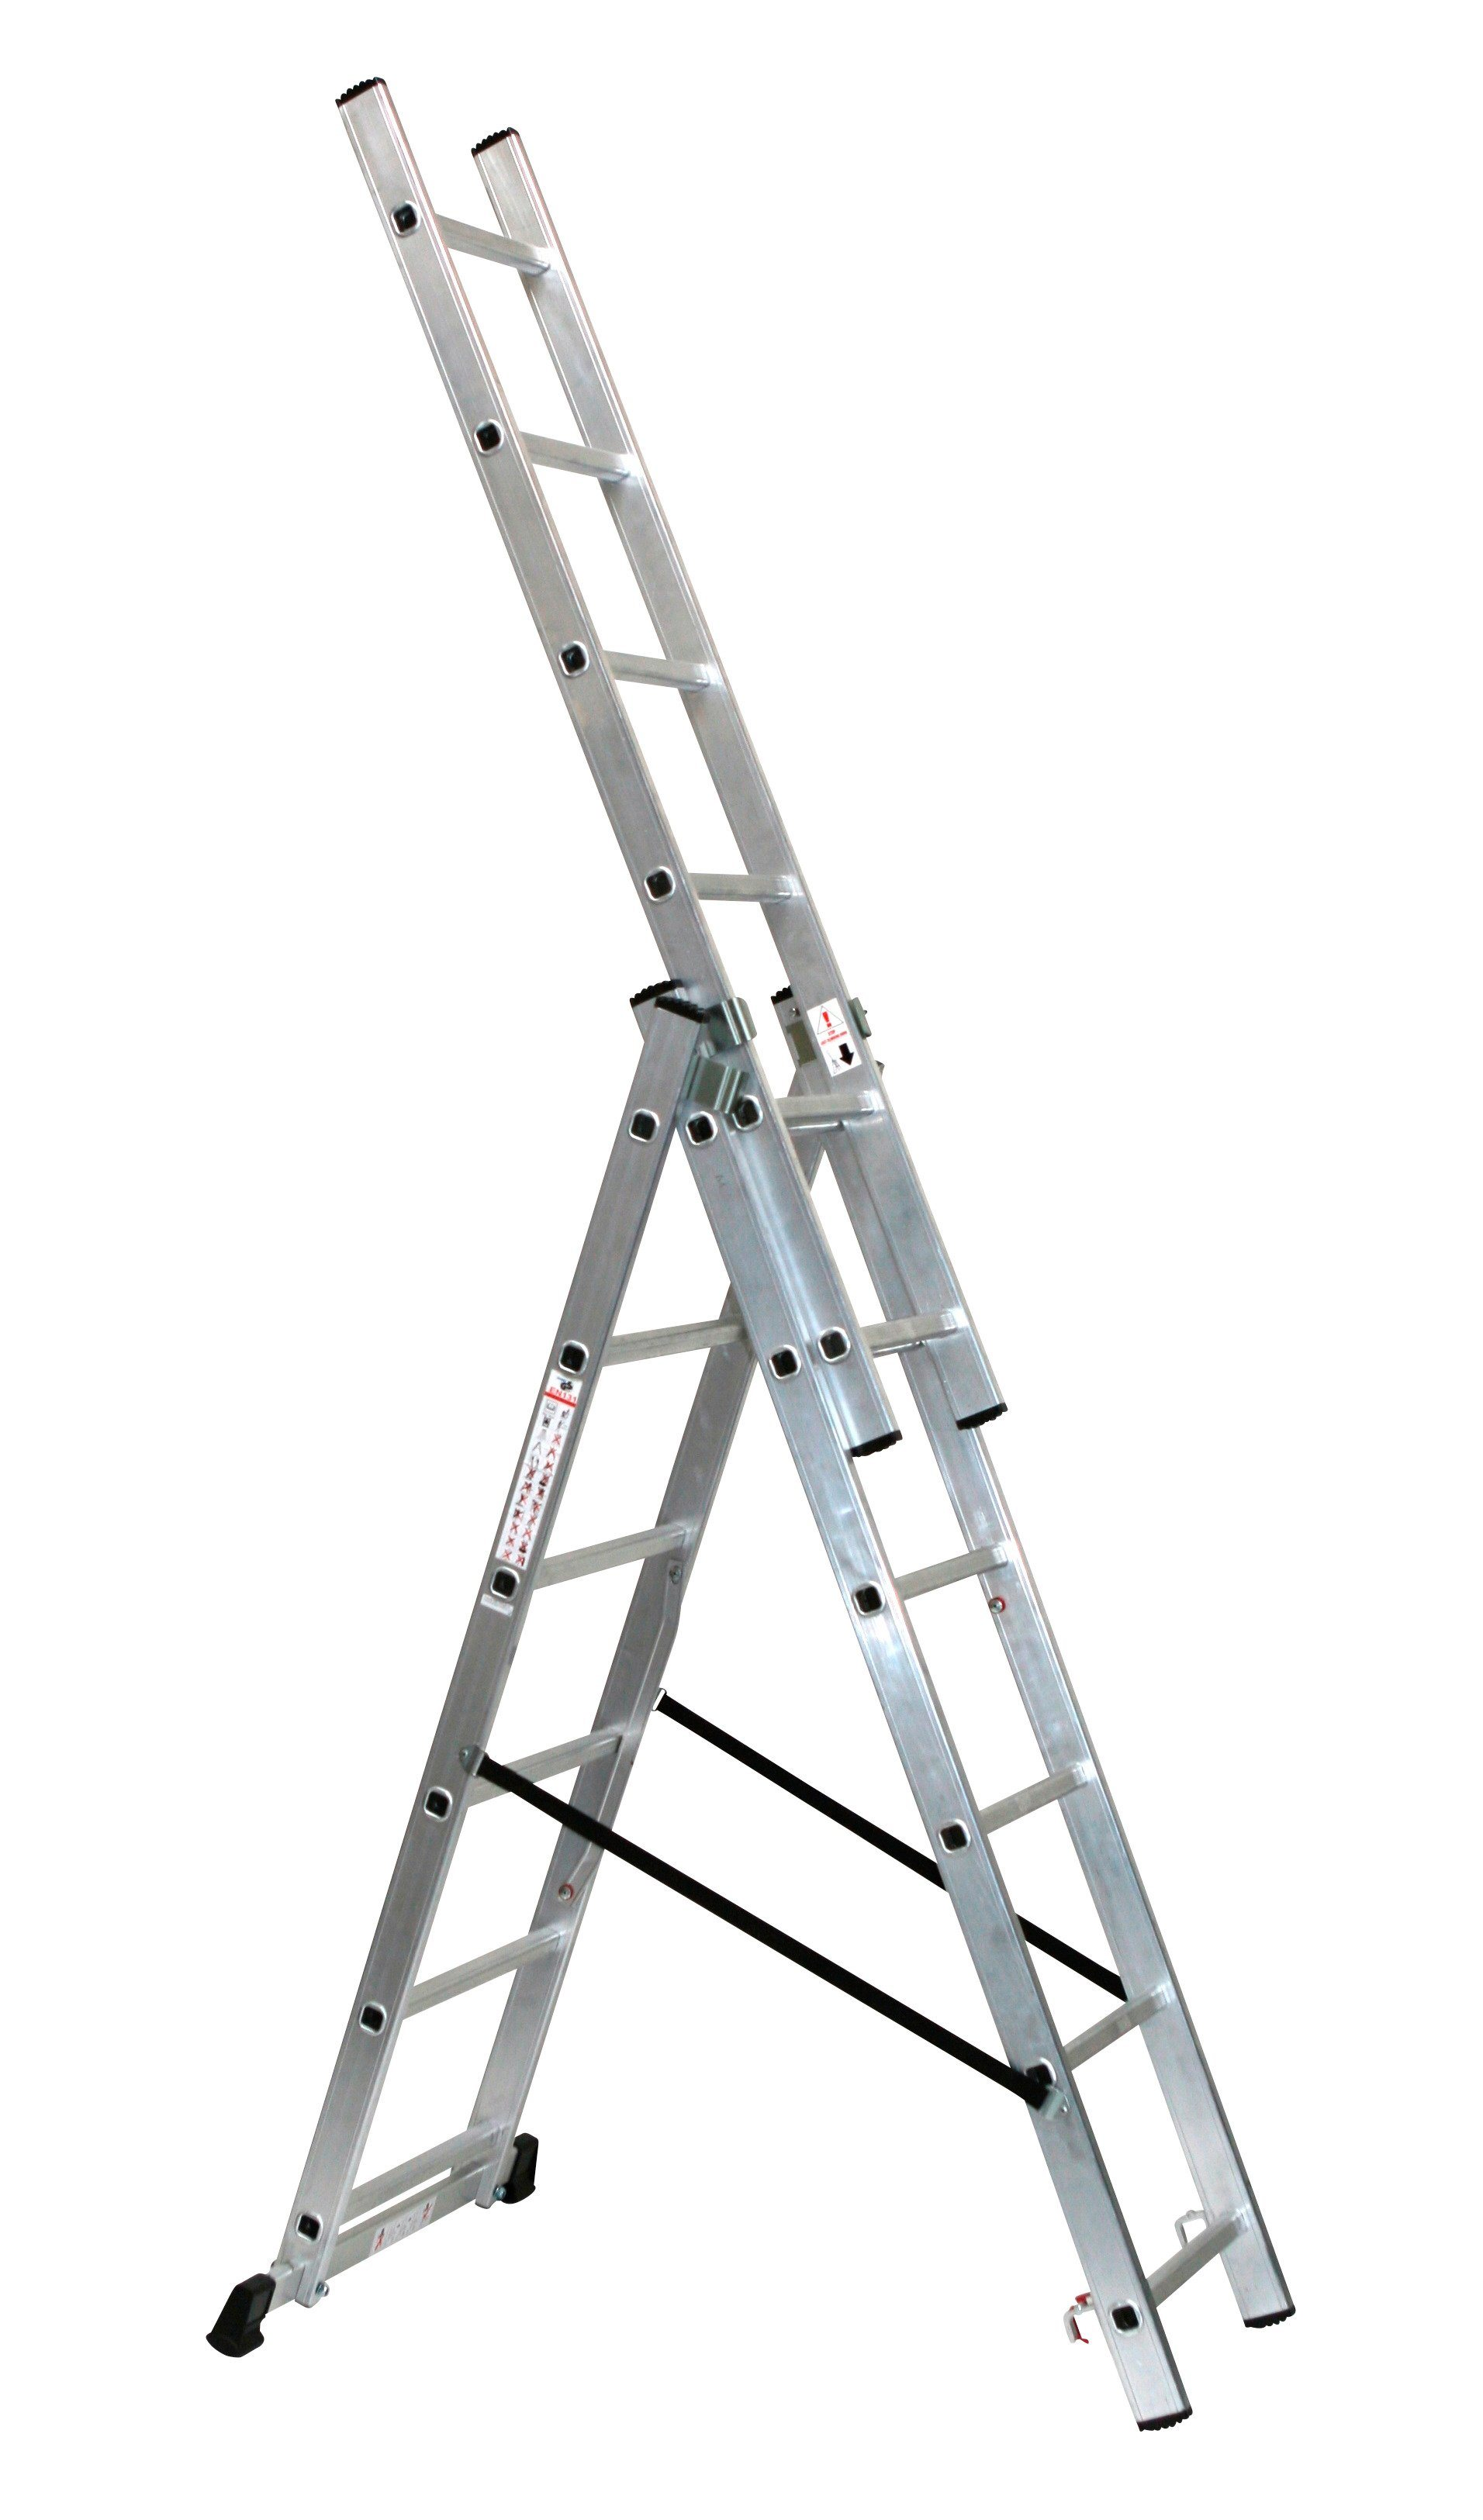 SZ METALL Alu-Schiebeleiter »6 x 3 Sprossen« | Baumarkt > Leitern und Treppen > Schiebeleiter | SZ Metall